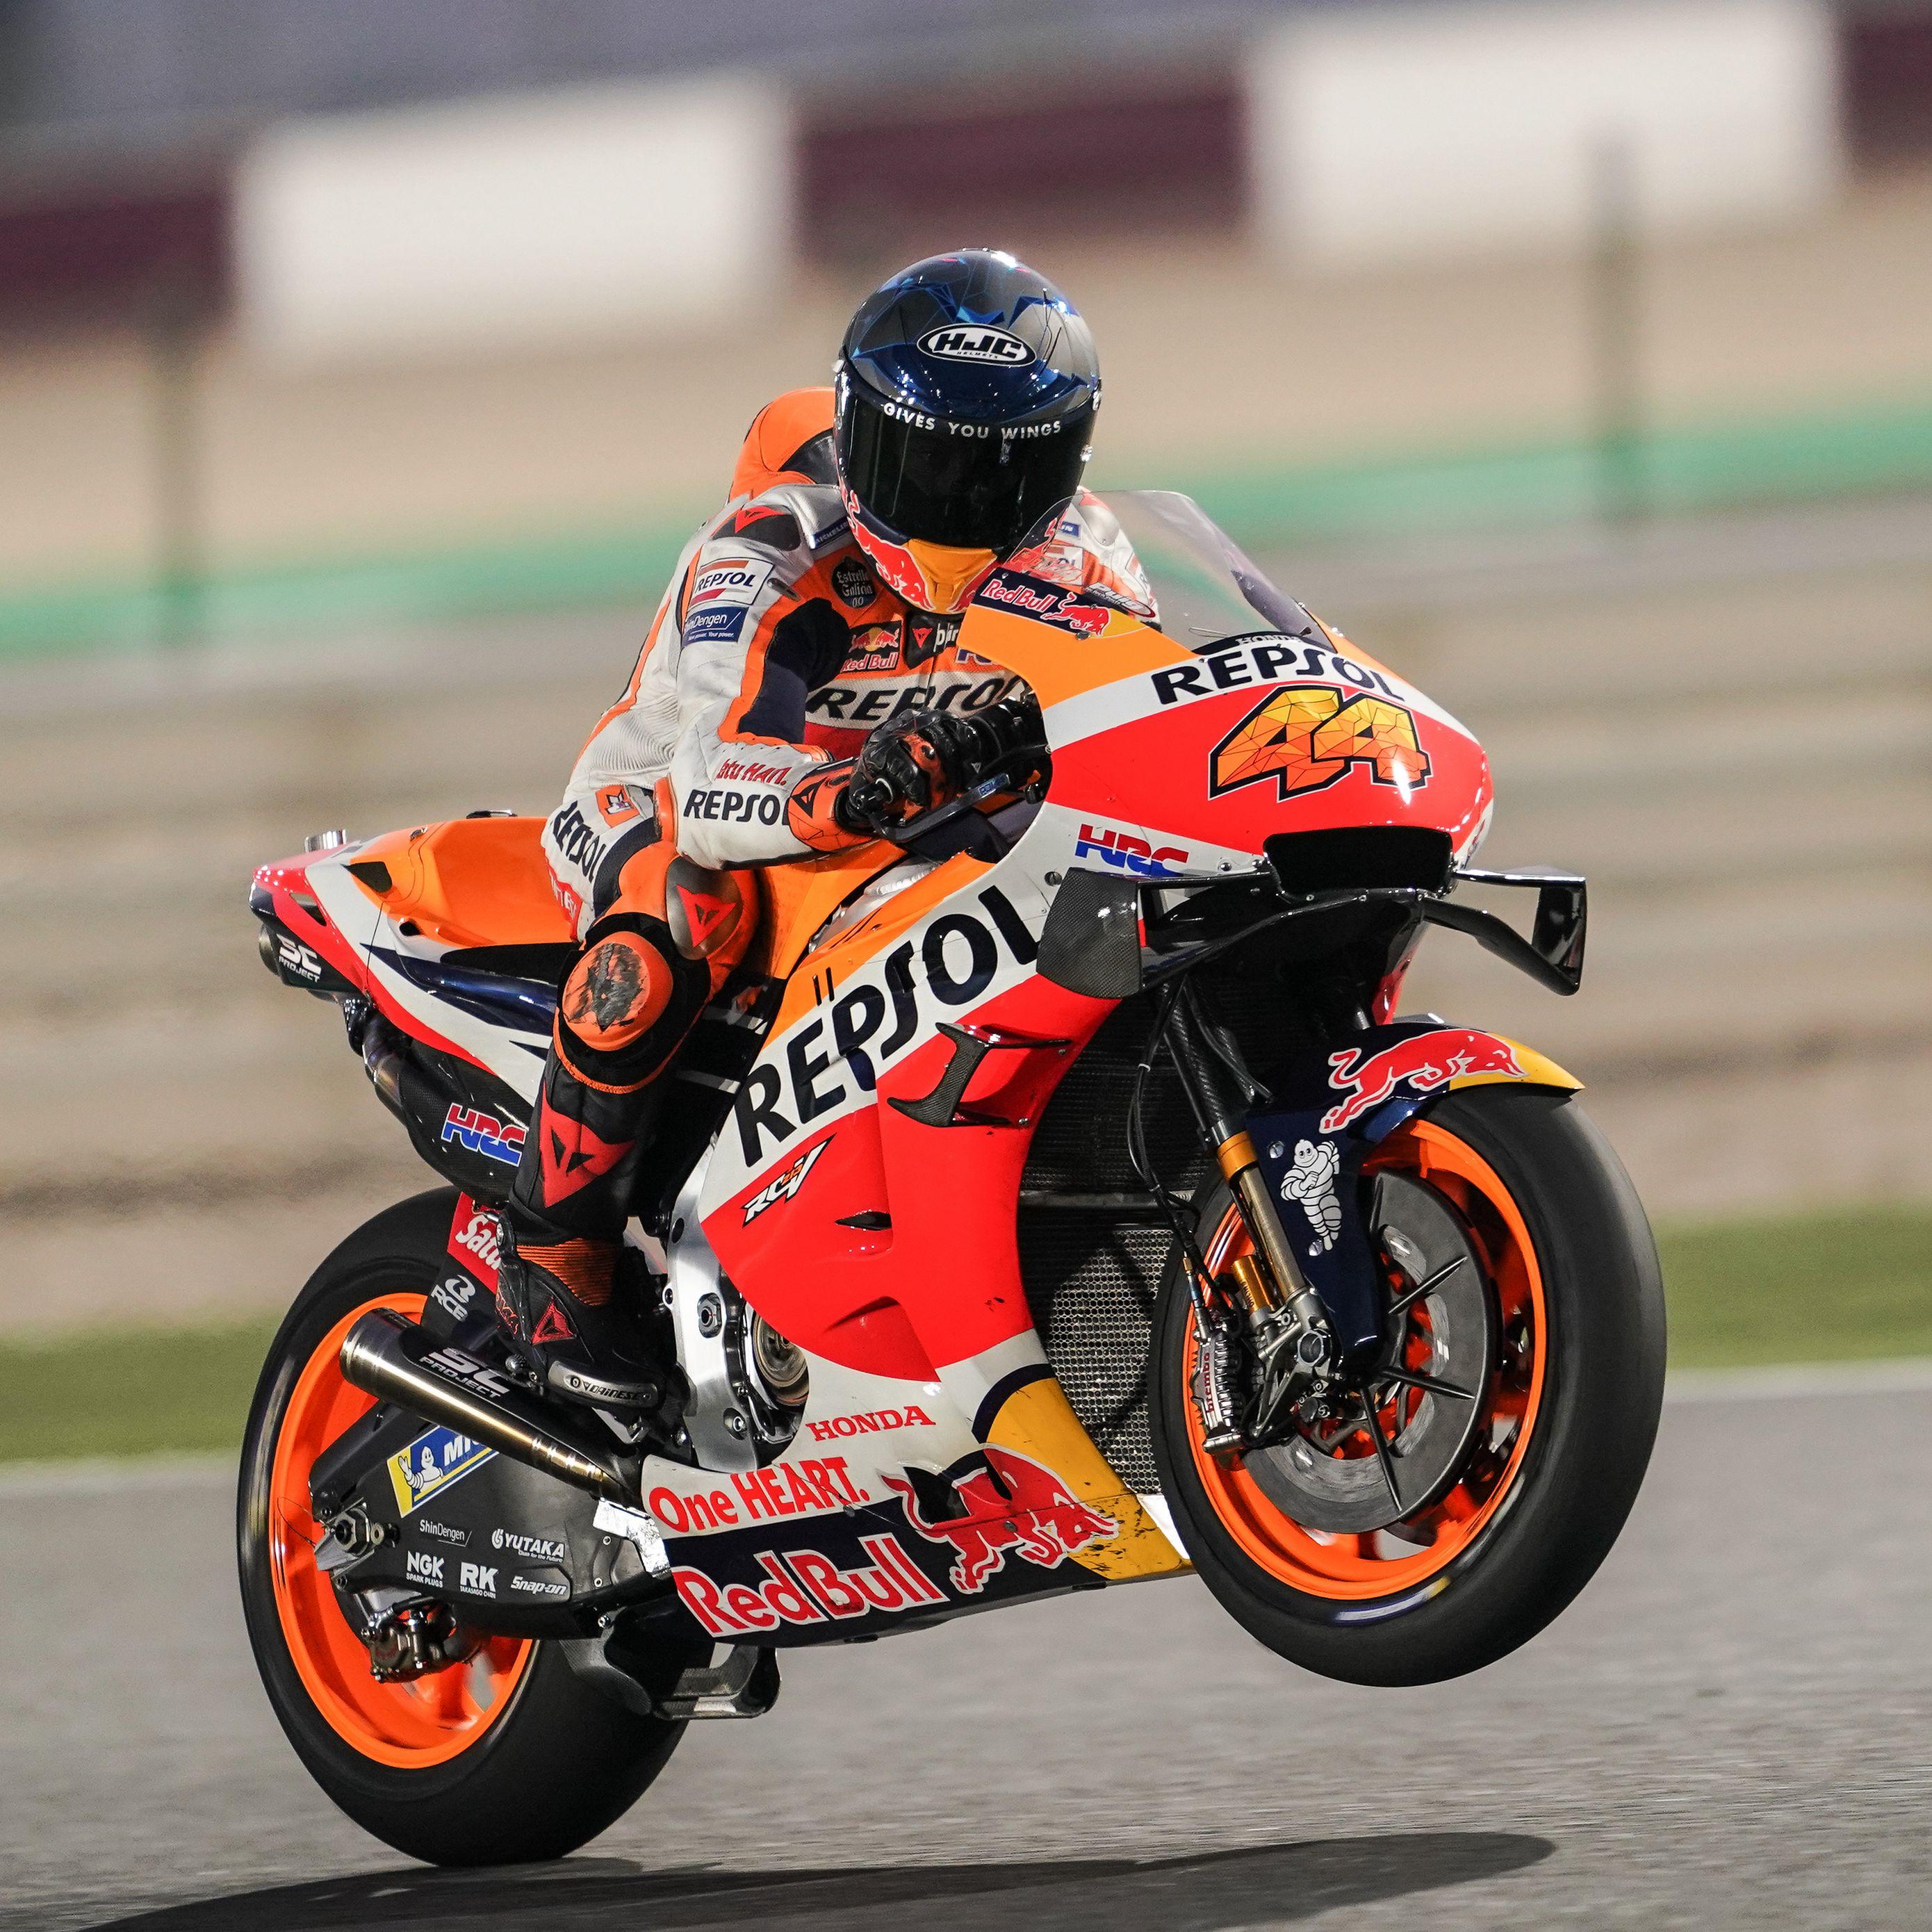 2780x2780 Wallpaper honda, motorcycle, motorcyclist, helmet, speed, track, orange